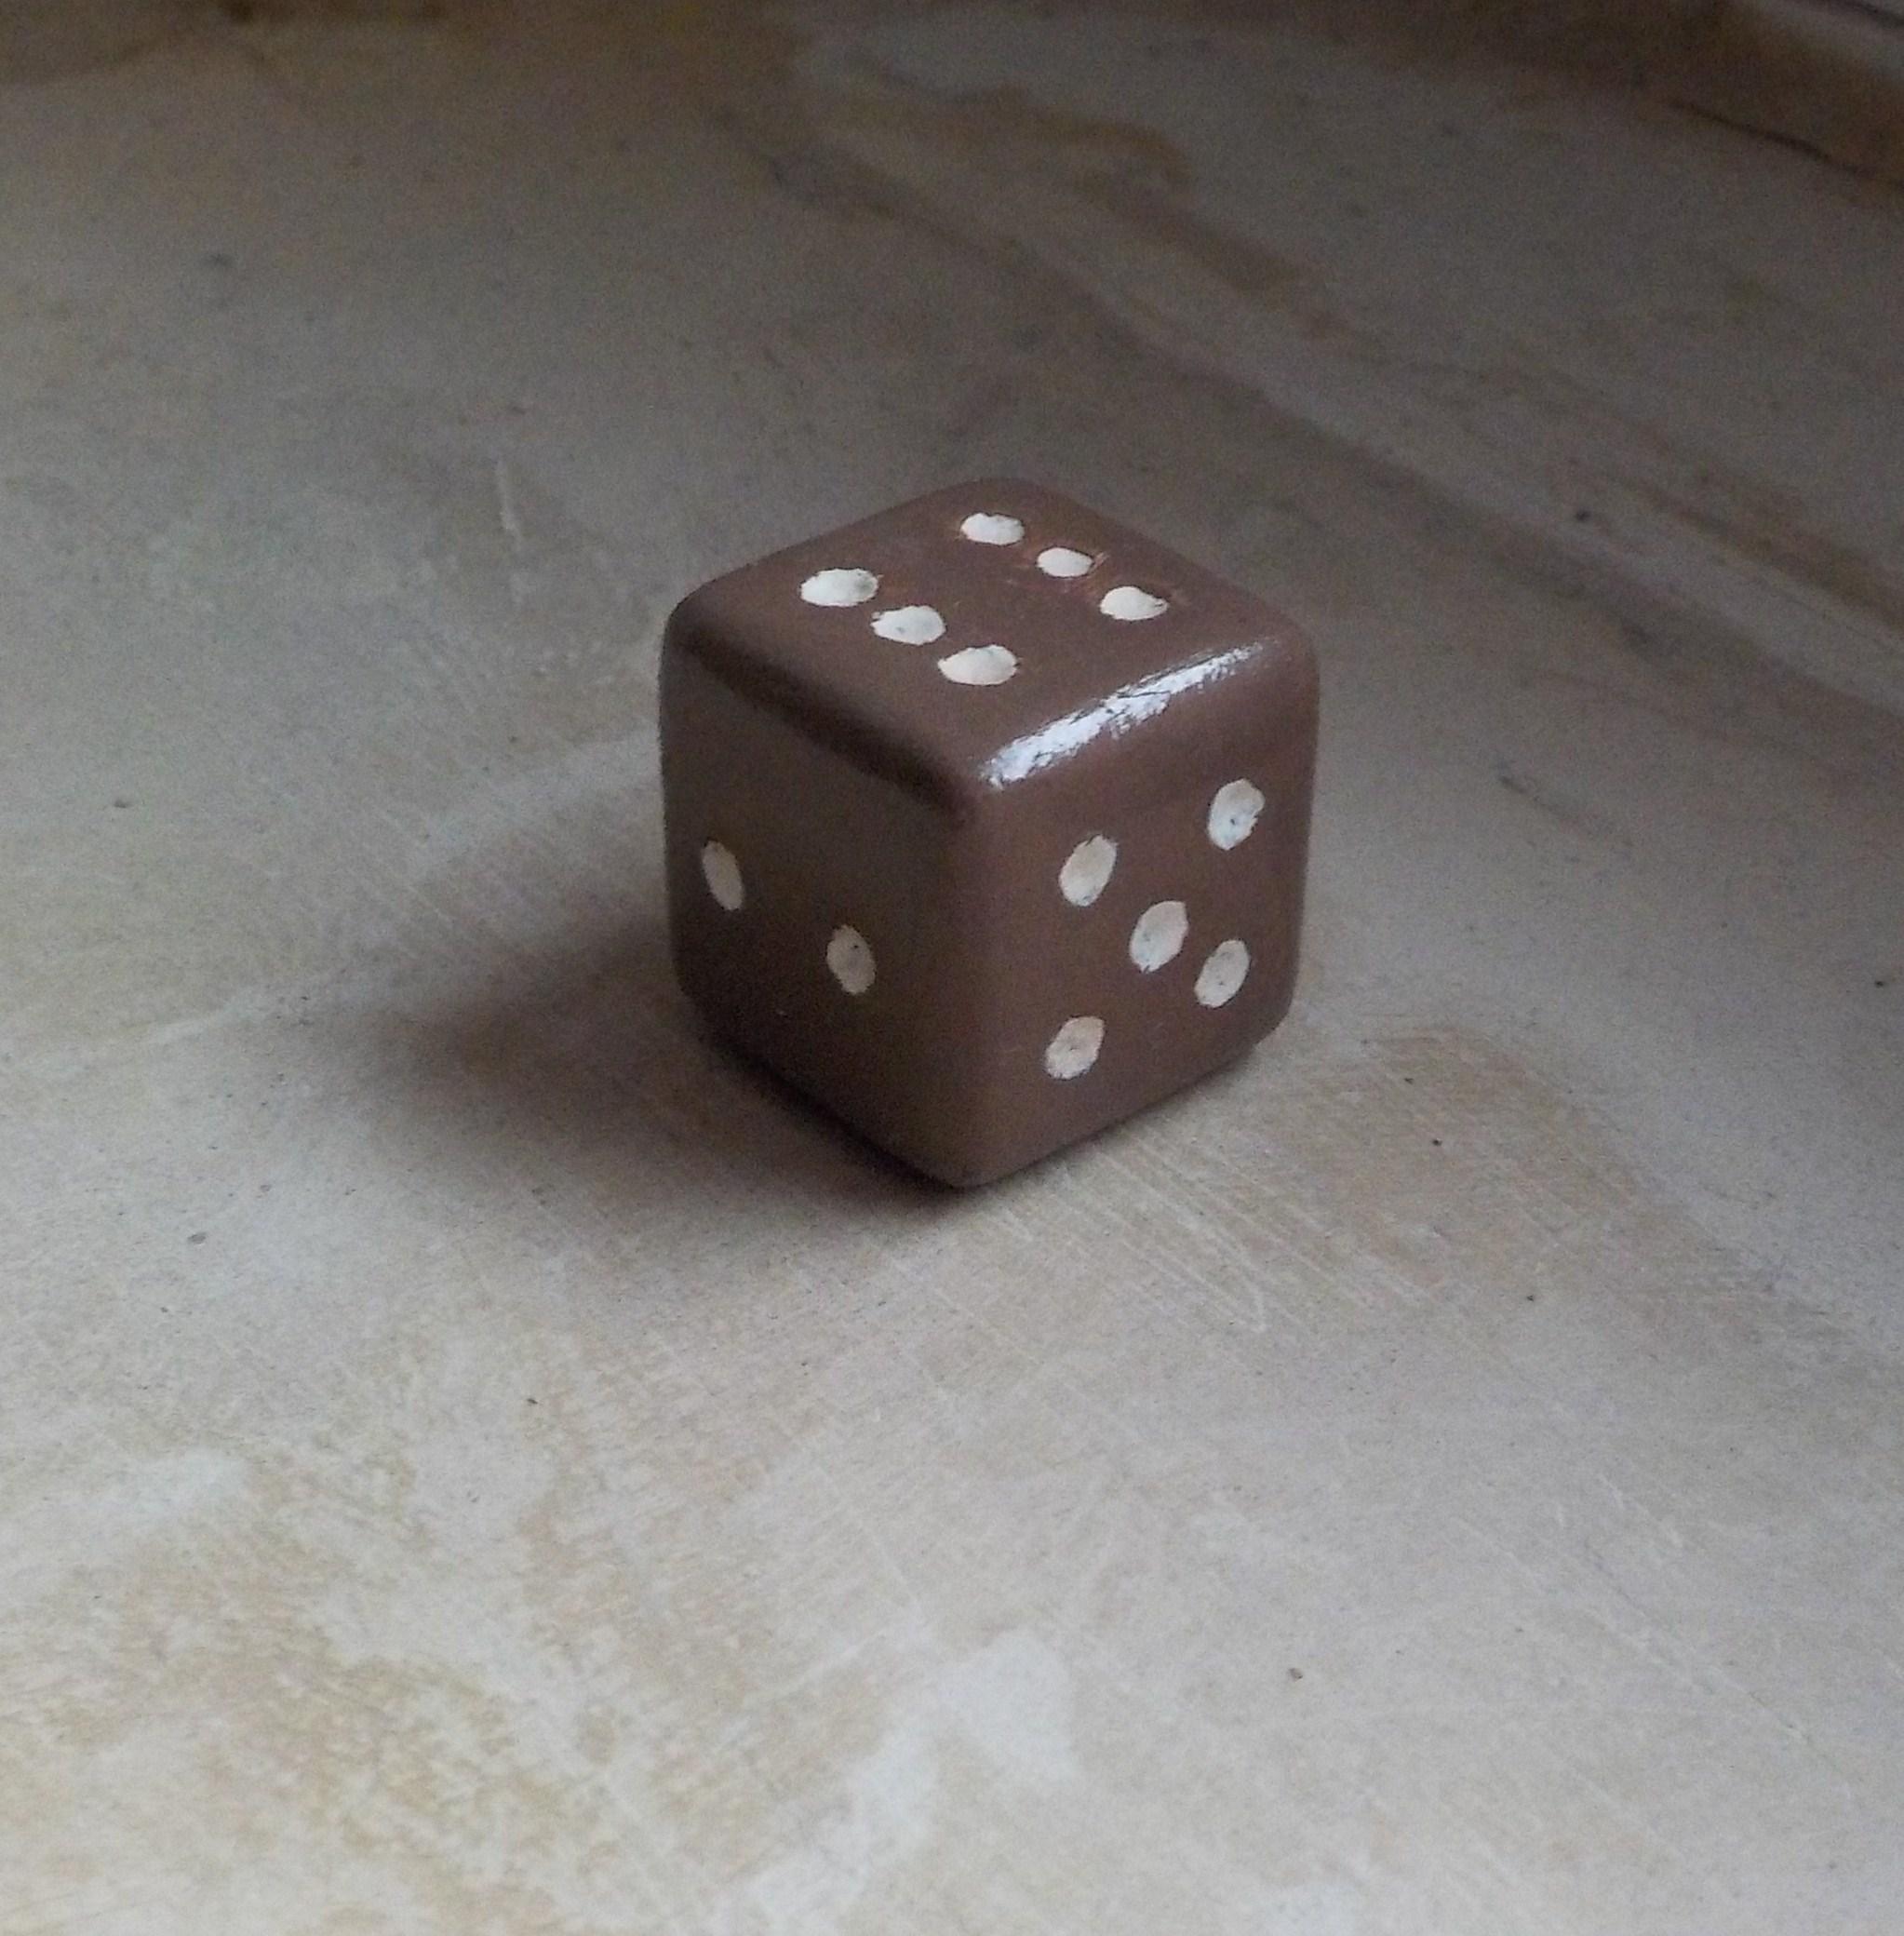 DSCN2418.JPG Download free STL file dice, stuffing article • 3D printable model, honorin